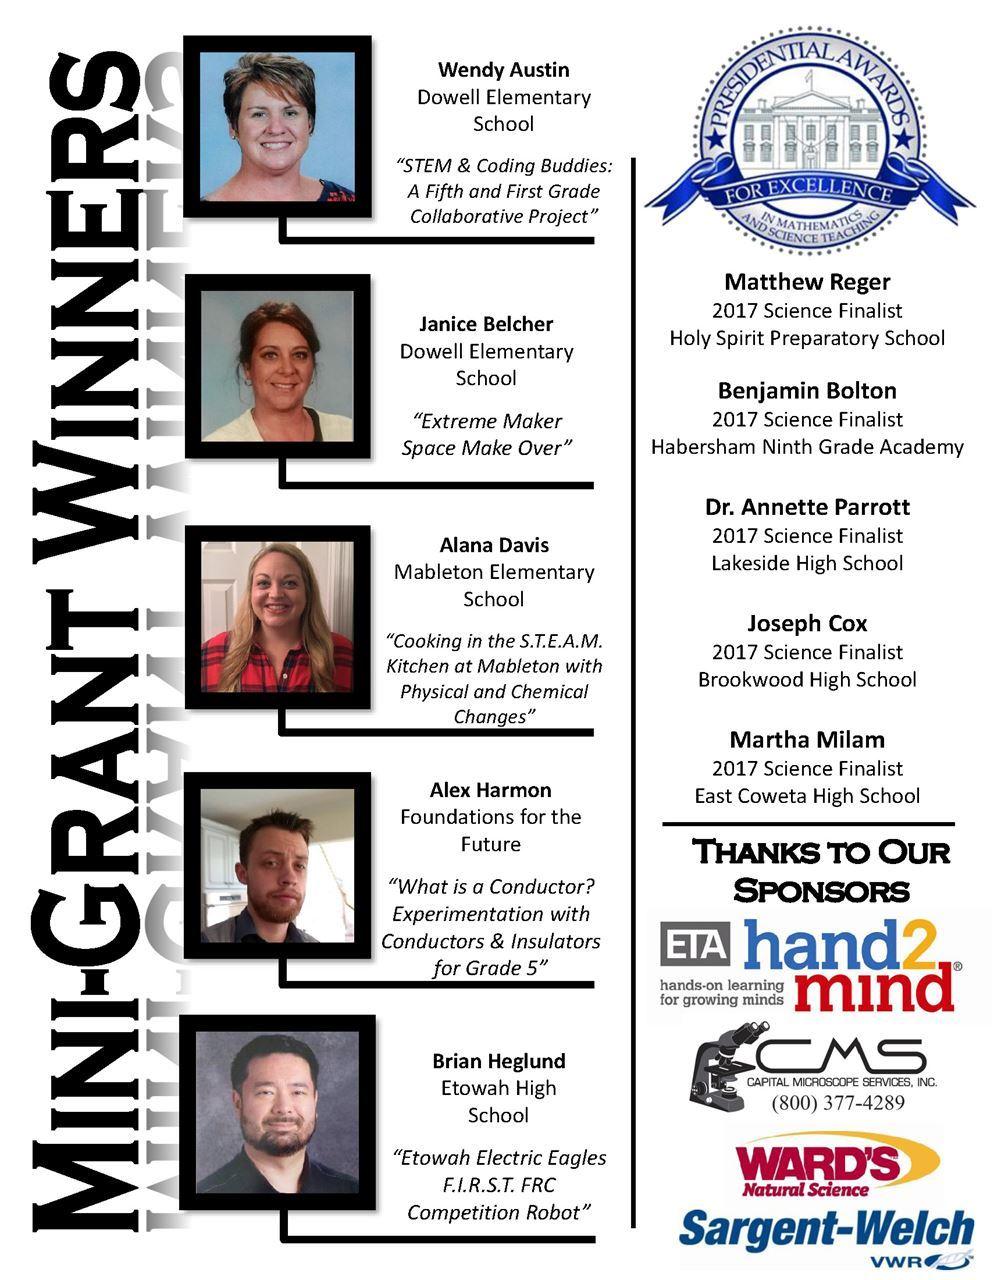 Georgia Science Teachers Association - Award Winners